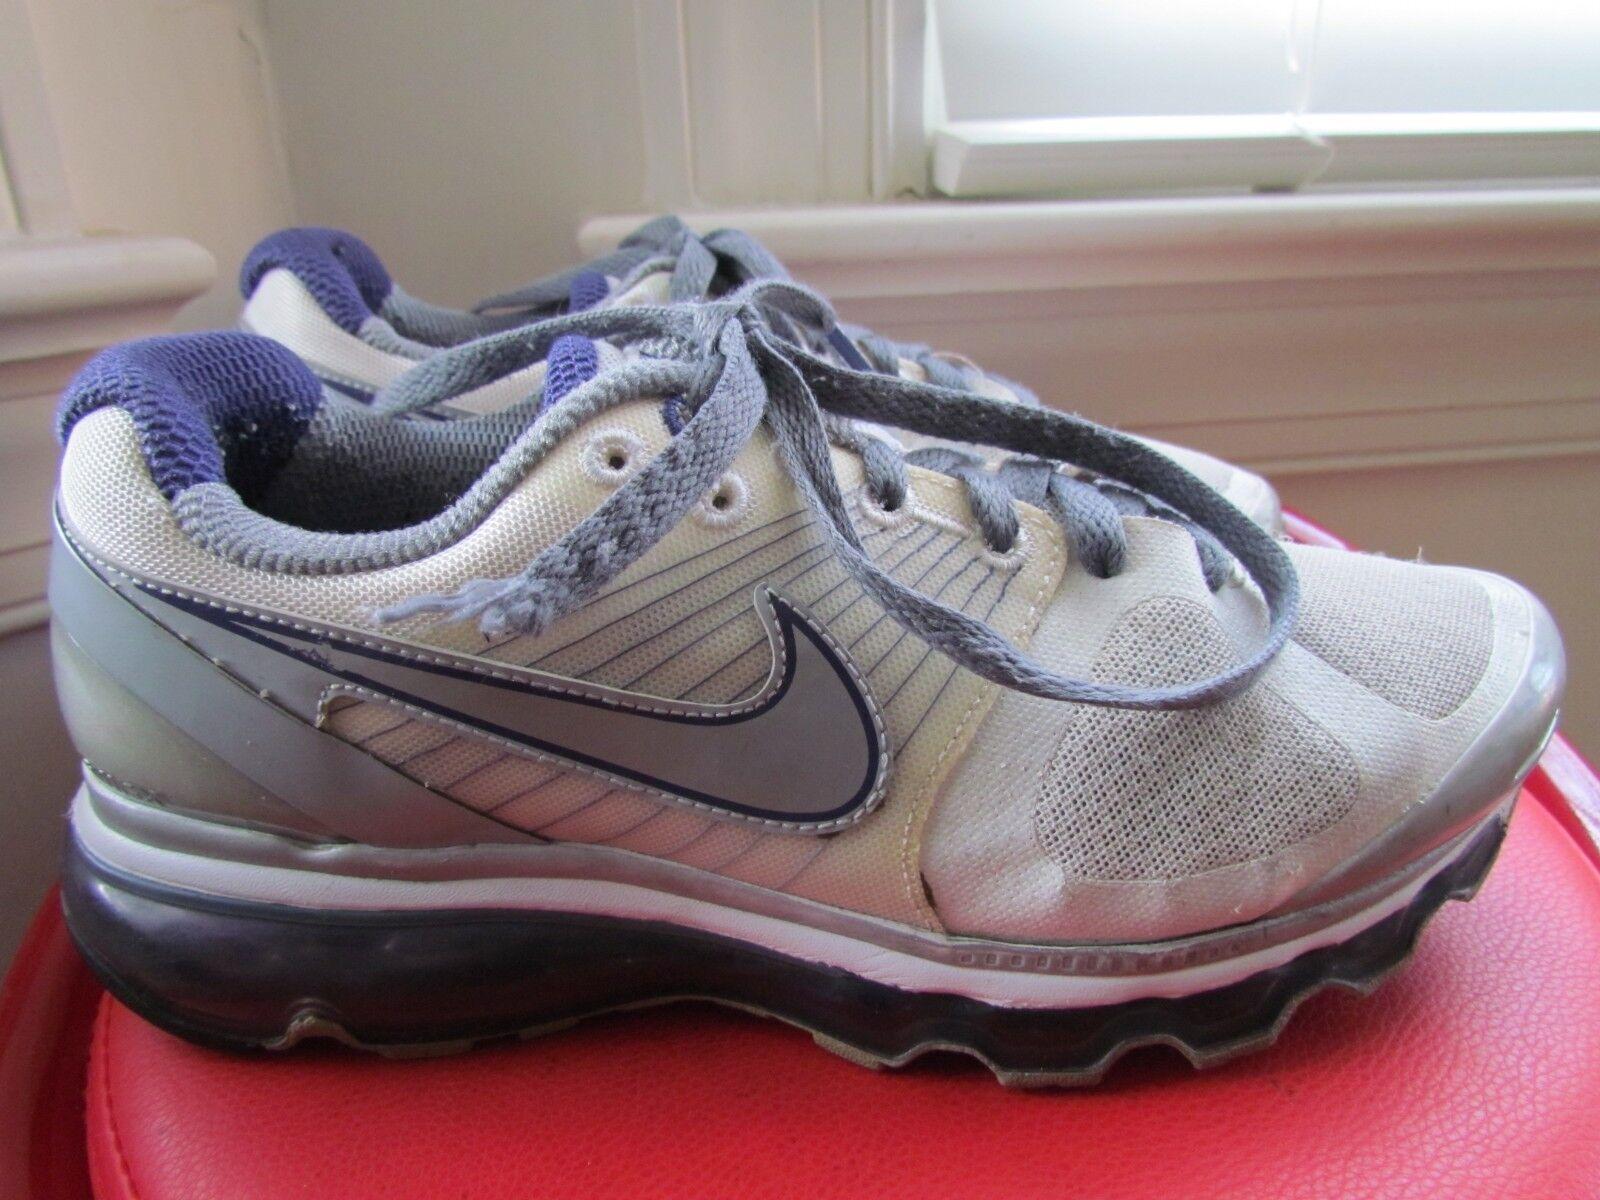 nike nike nike airmax pelle donne 'sneakers 8   Ultima Tecnologia    Uomo/Donna Scarpa  fcd7d8